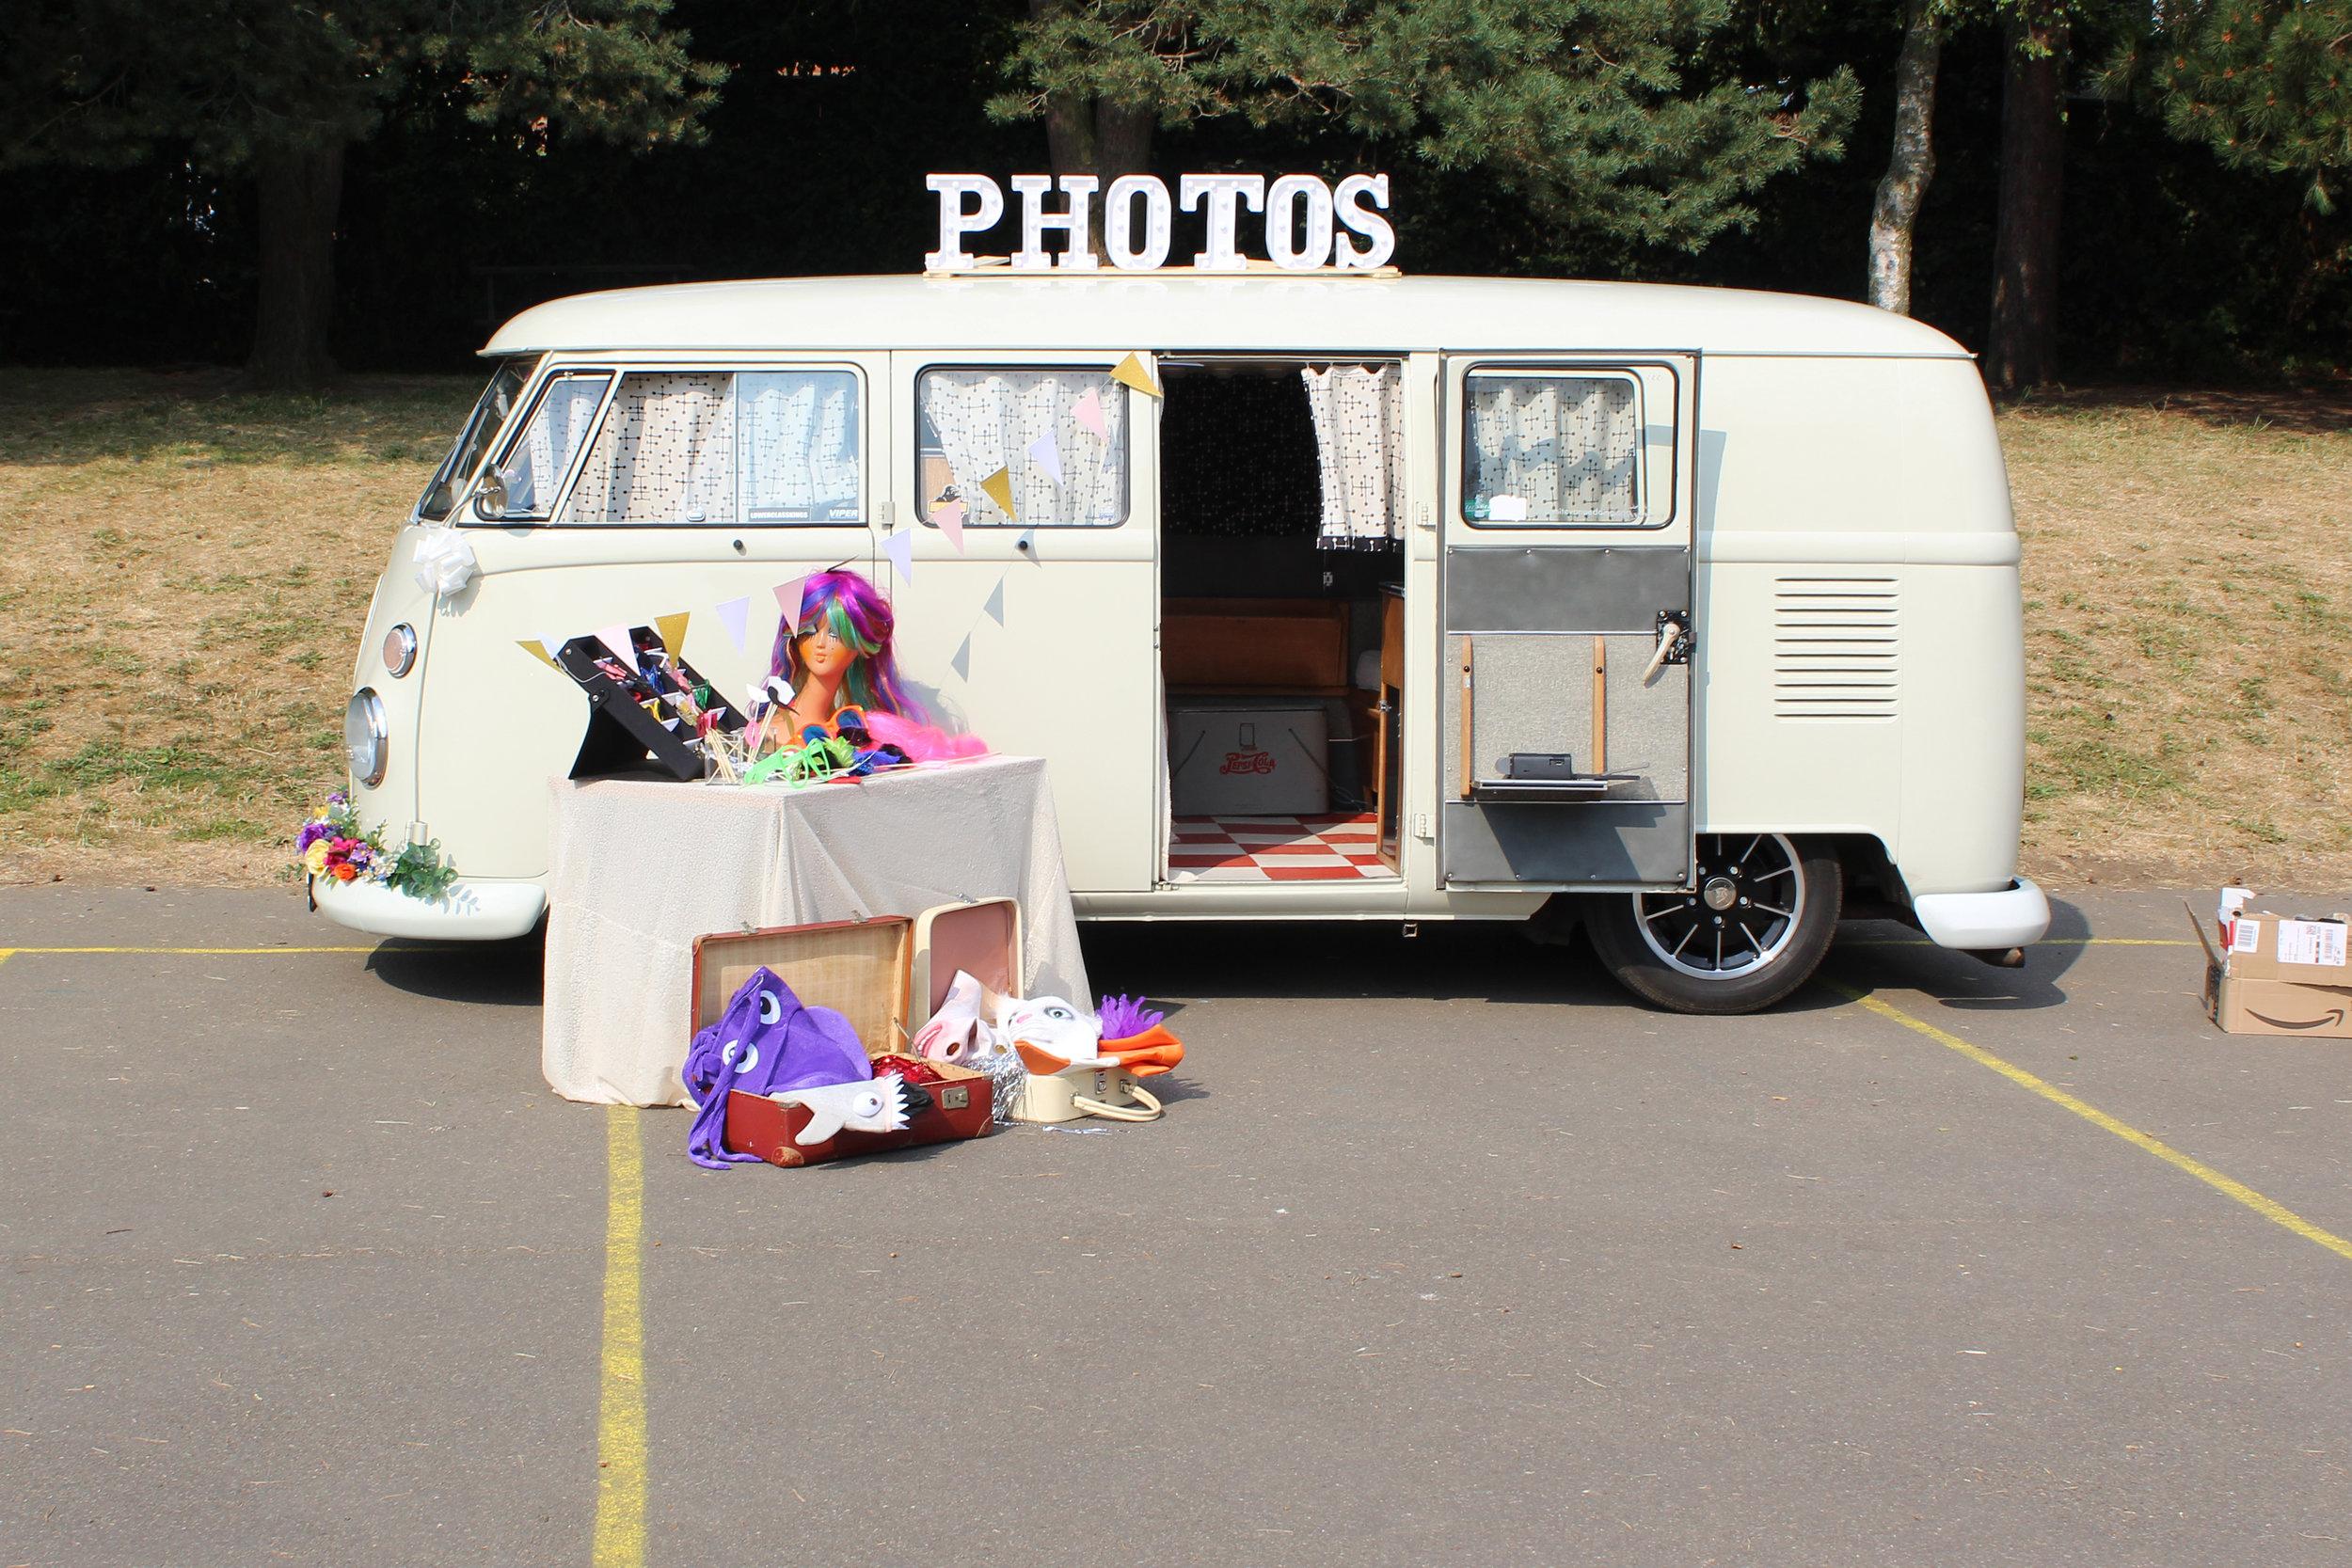 photo-booth-maidstone.jpg